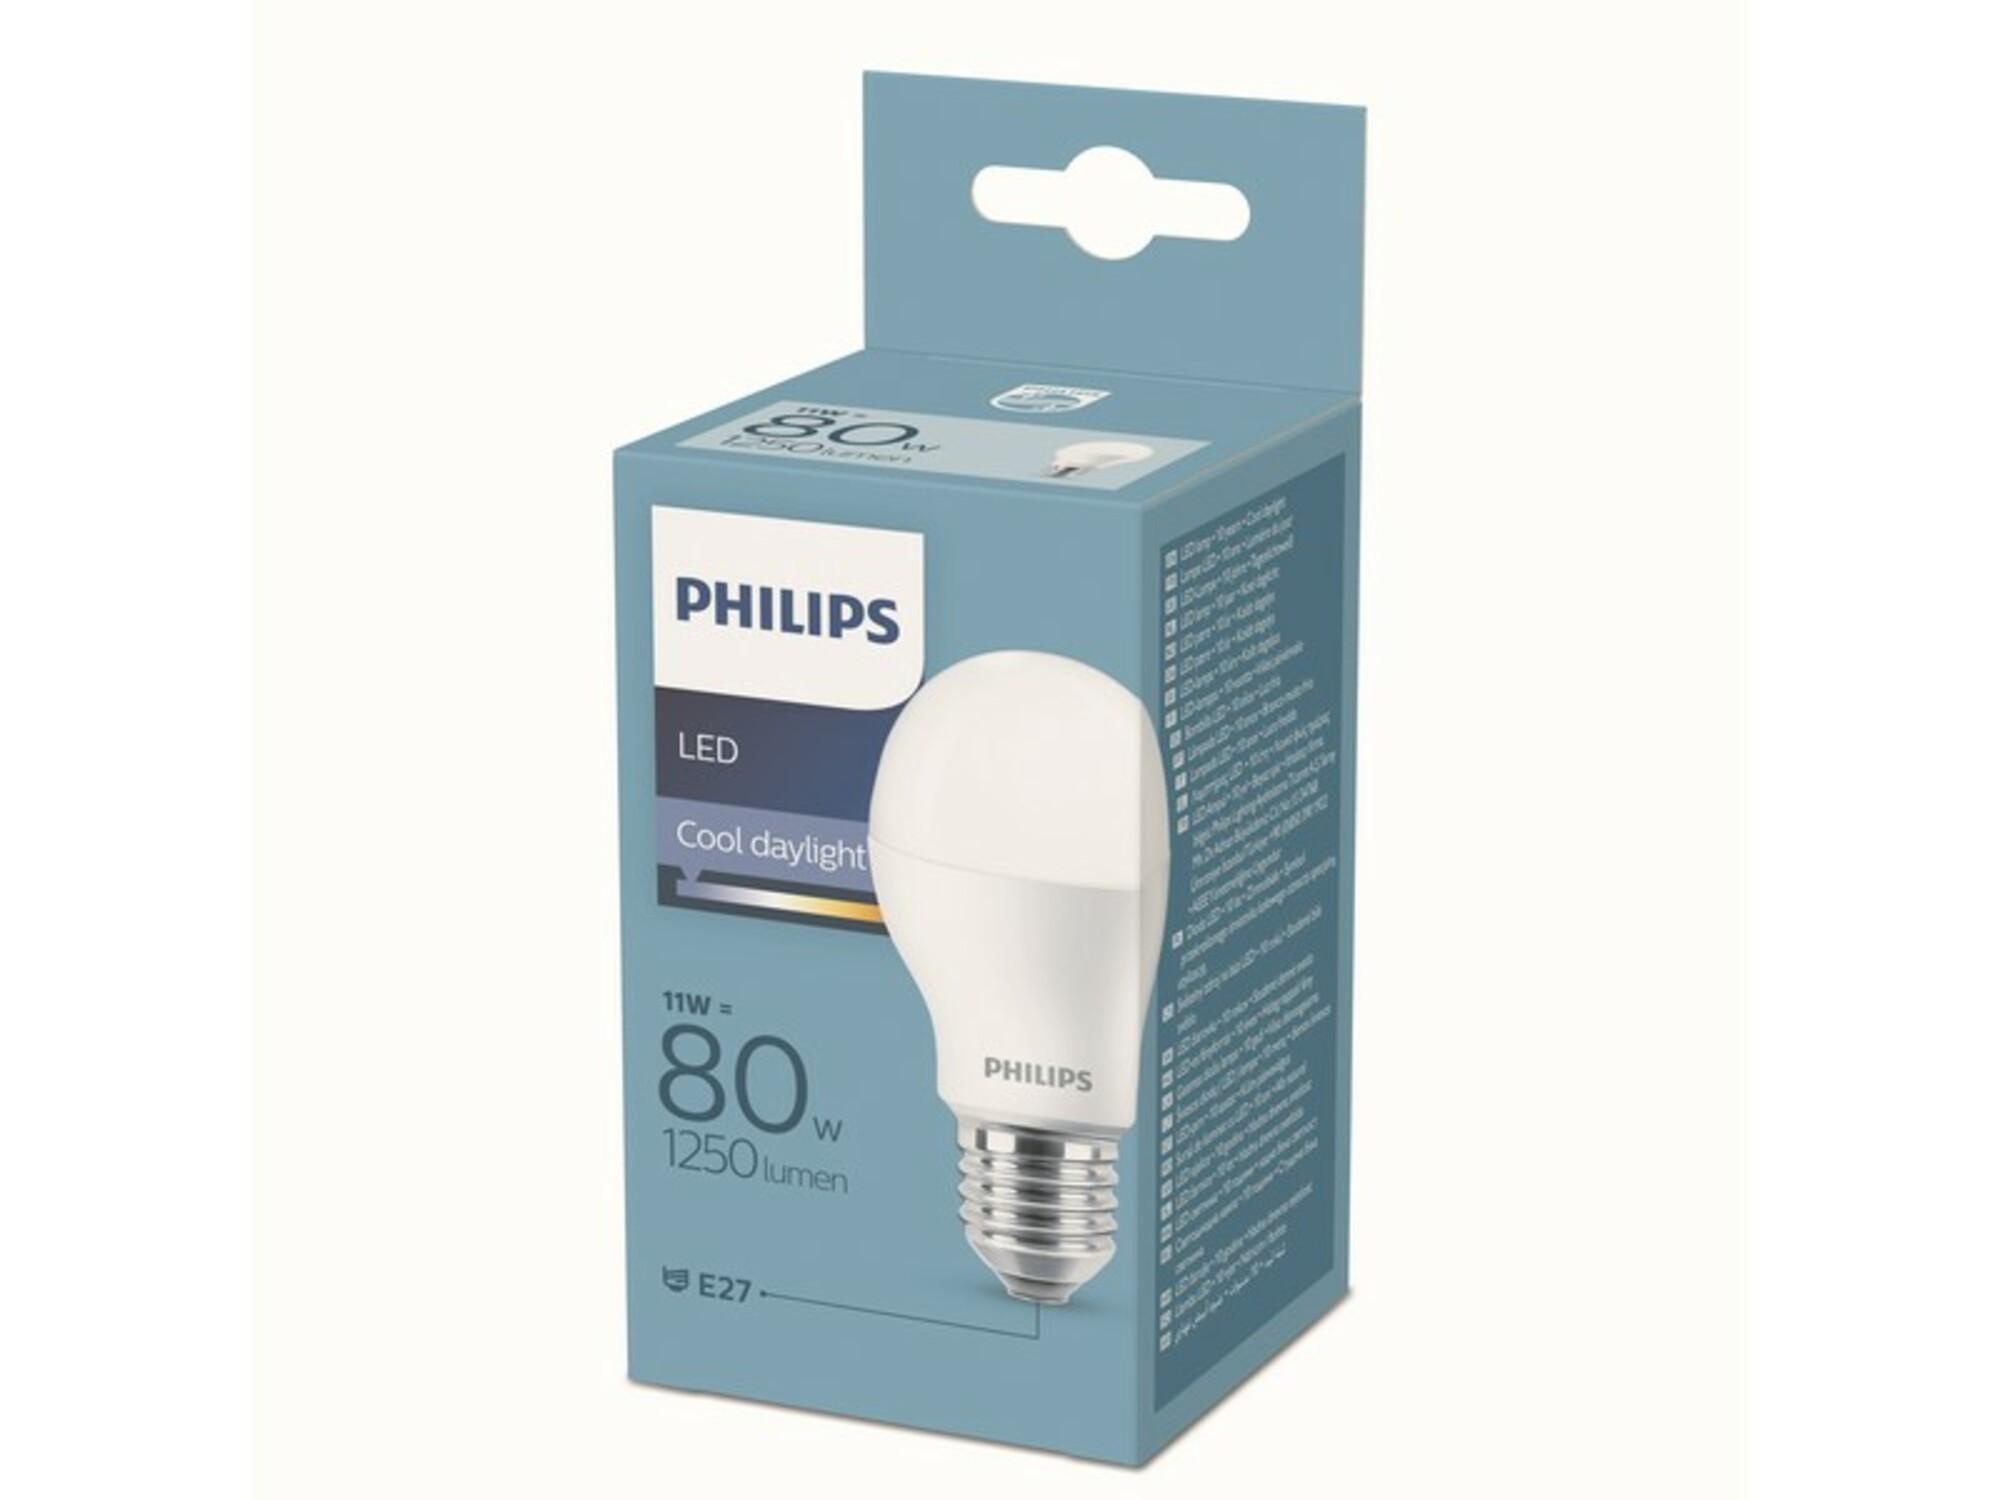 Philips Led Sijalica, Grlo E27, Snaga 11W (80W)  Ps679